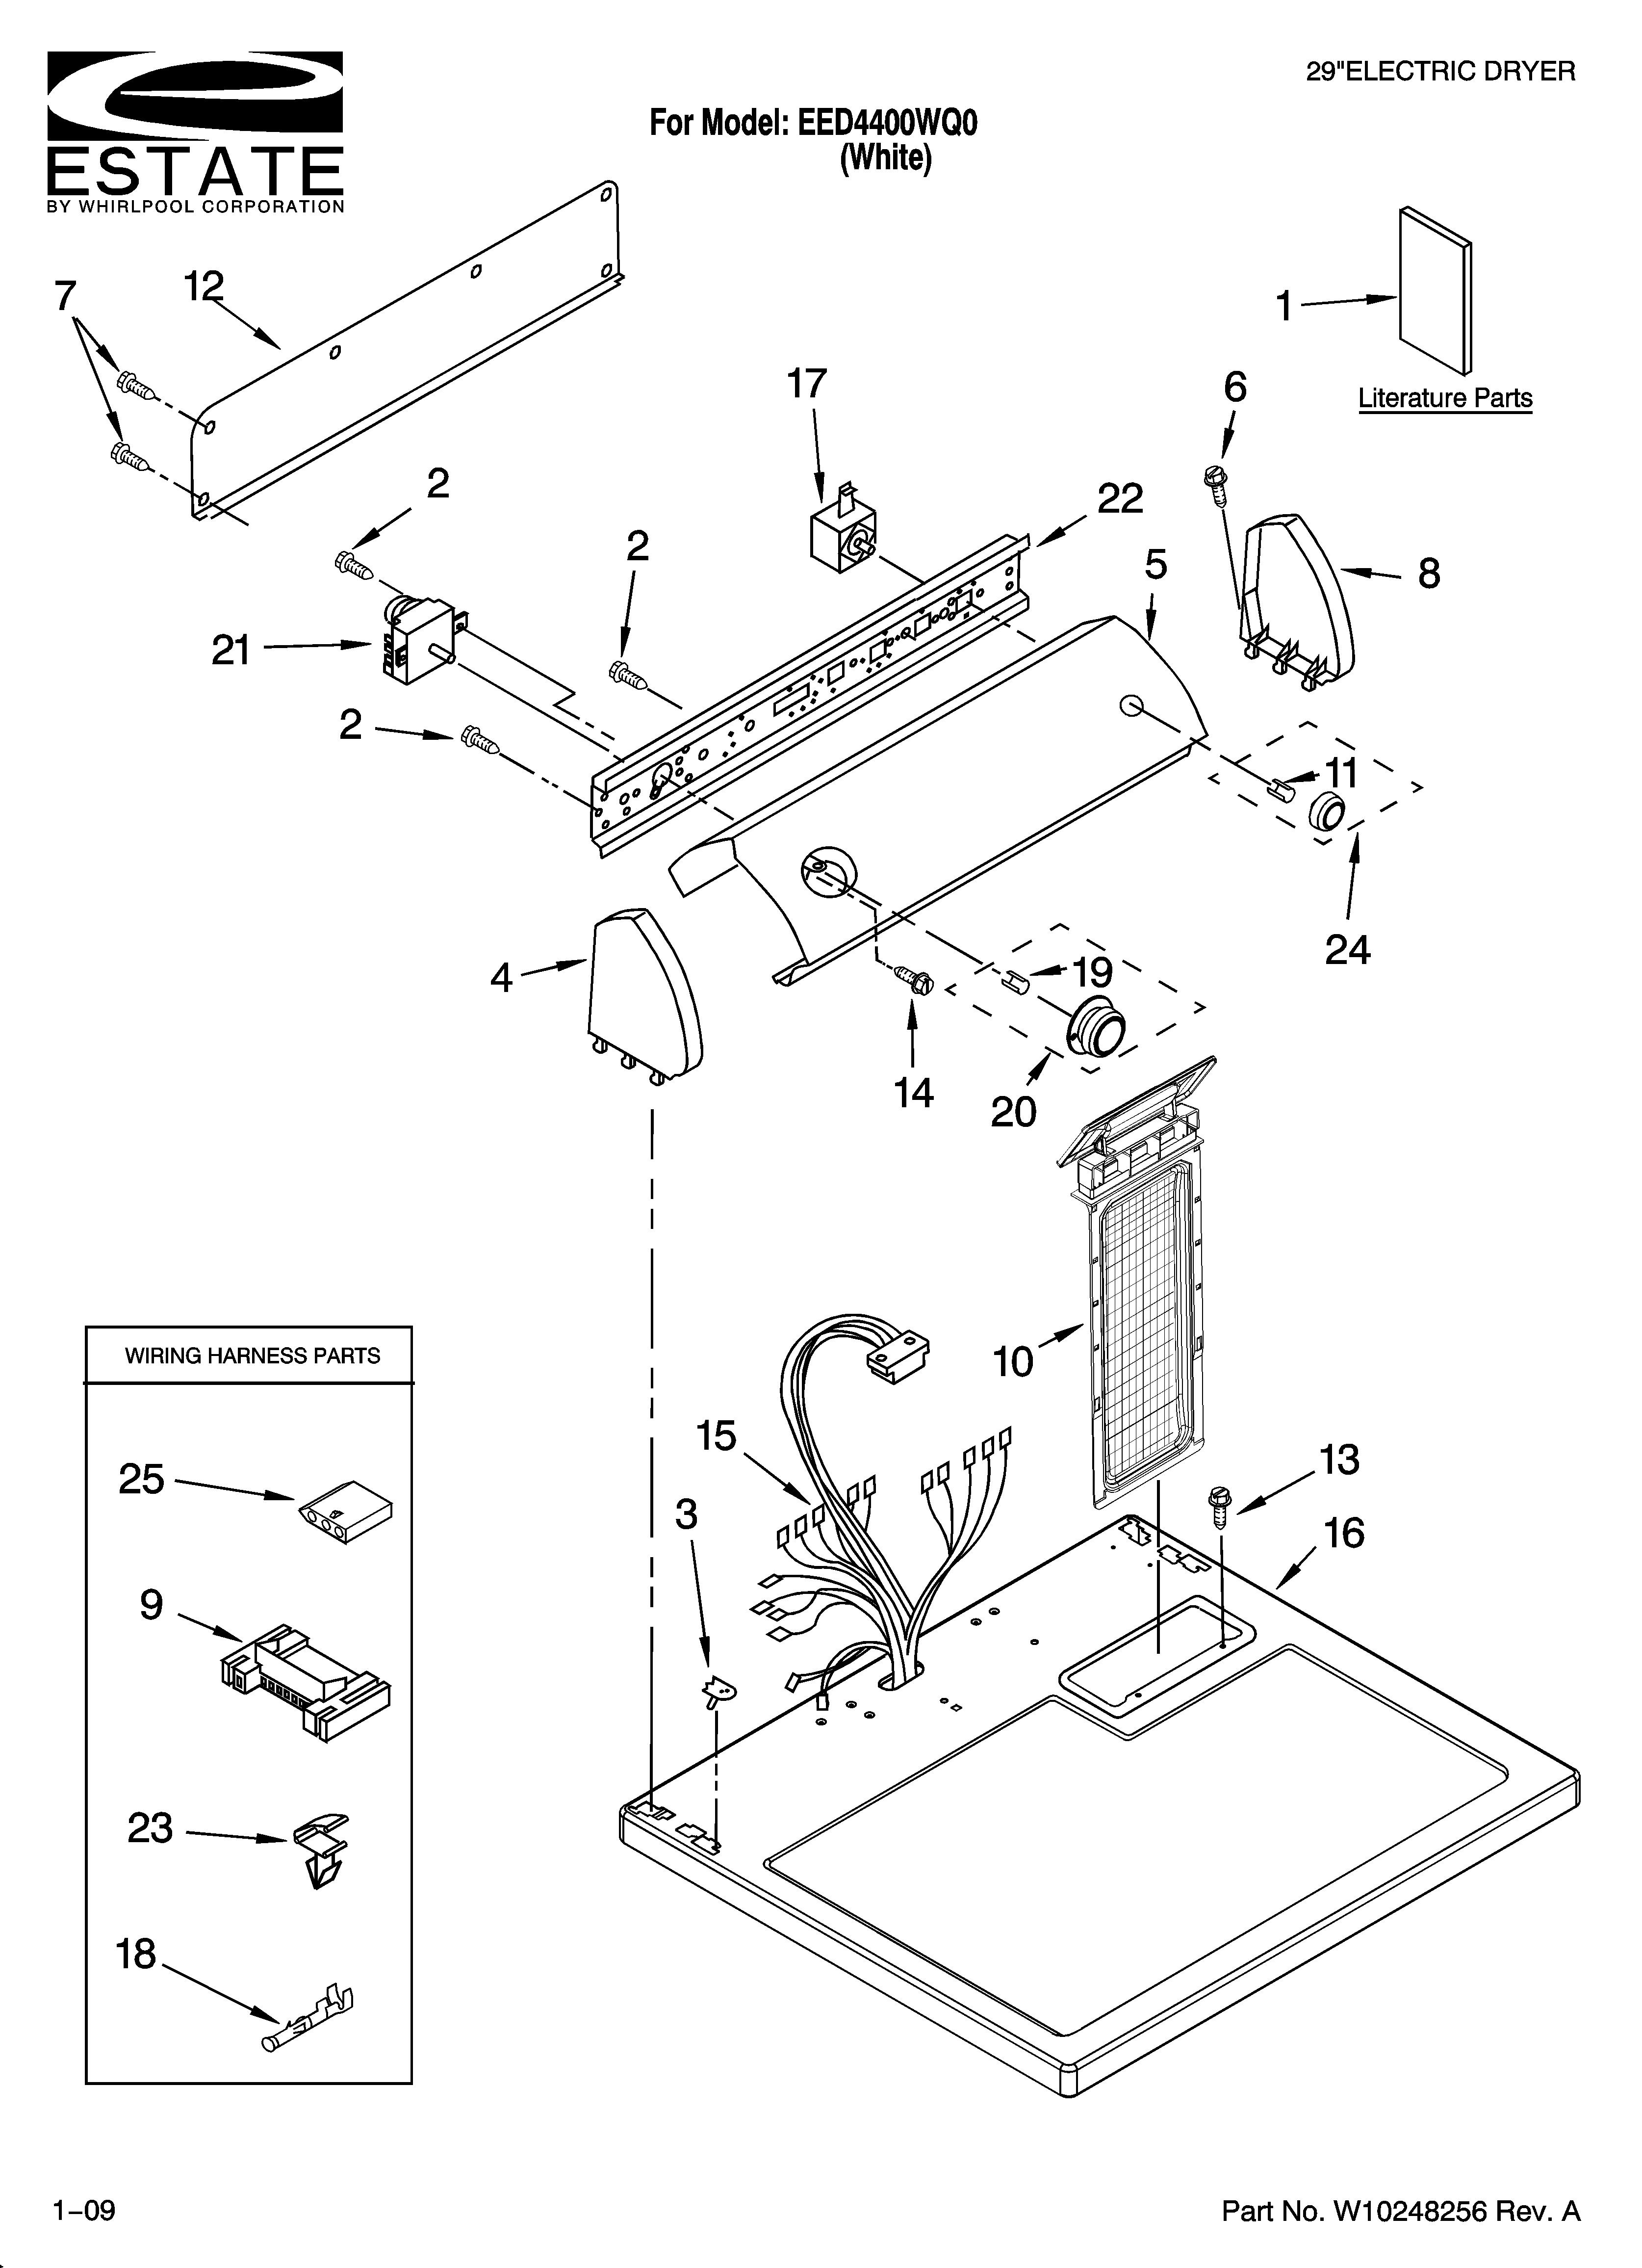 whirlpool dryer schematic wiring diagram ze 3288  whirlpool duet dryer wiring diagram on estate dryer parts  whirlpool duet dryer wiring diagram on